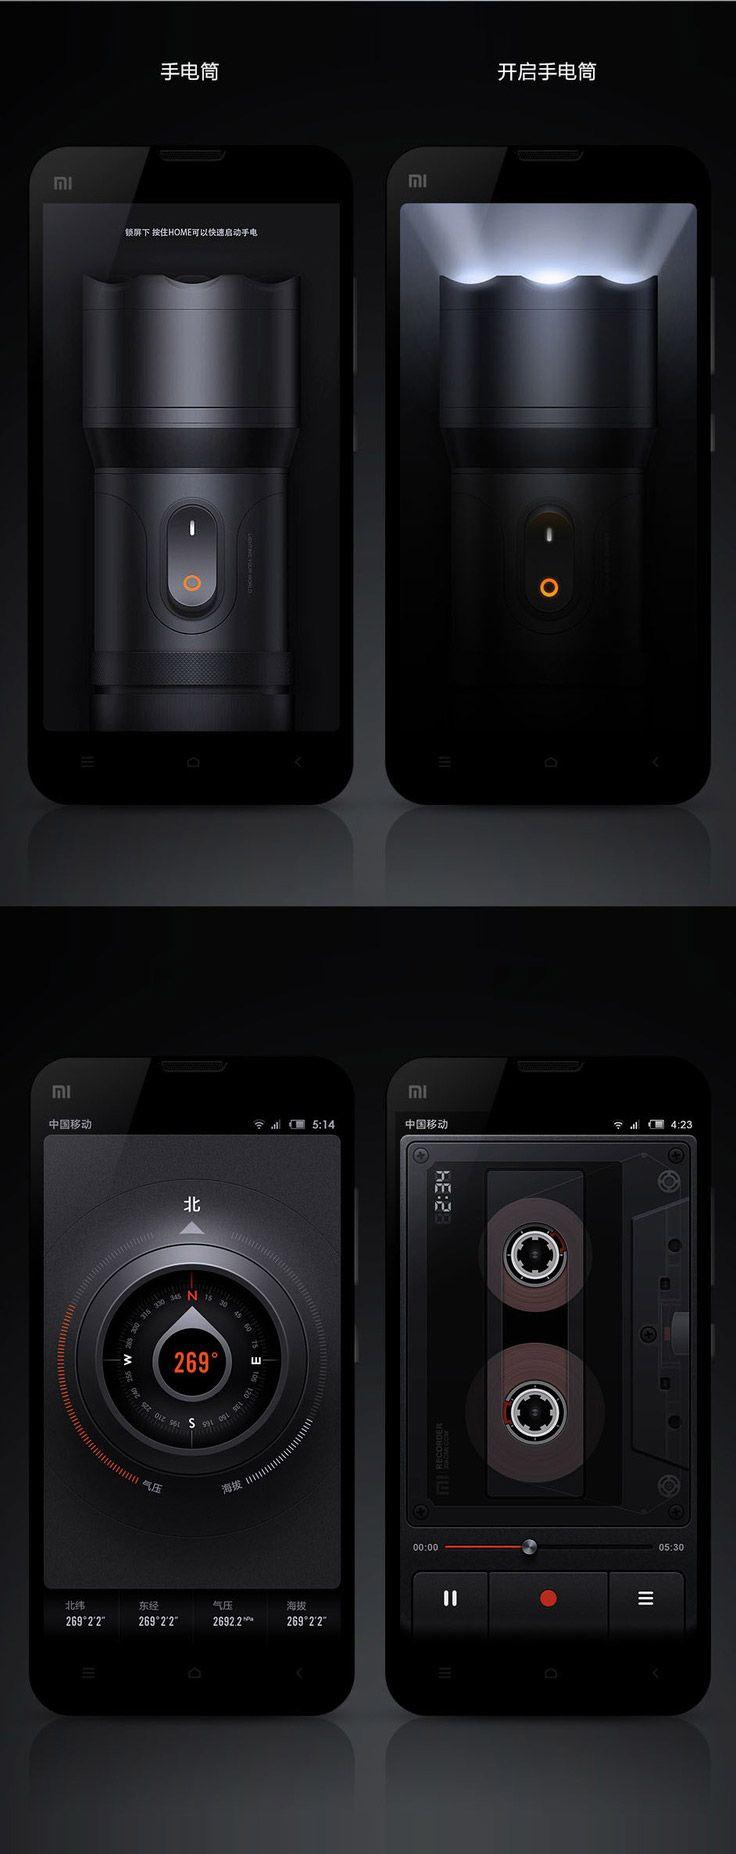 Mixed UI/UX design.